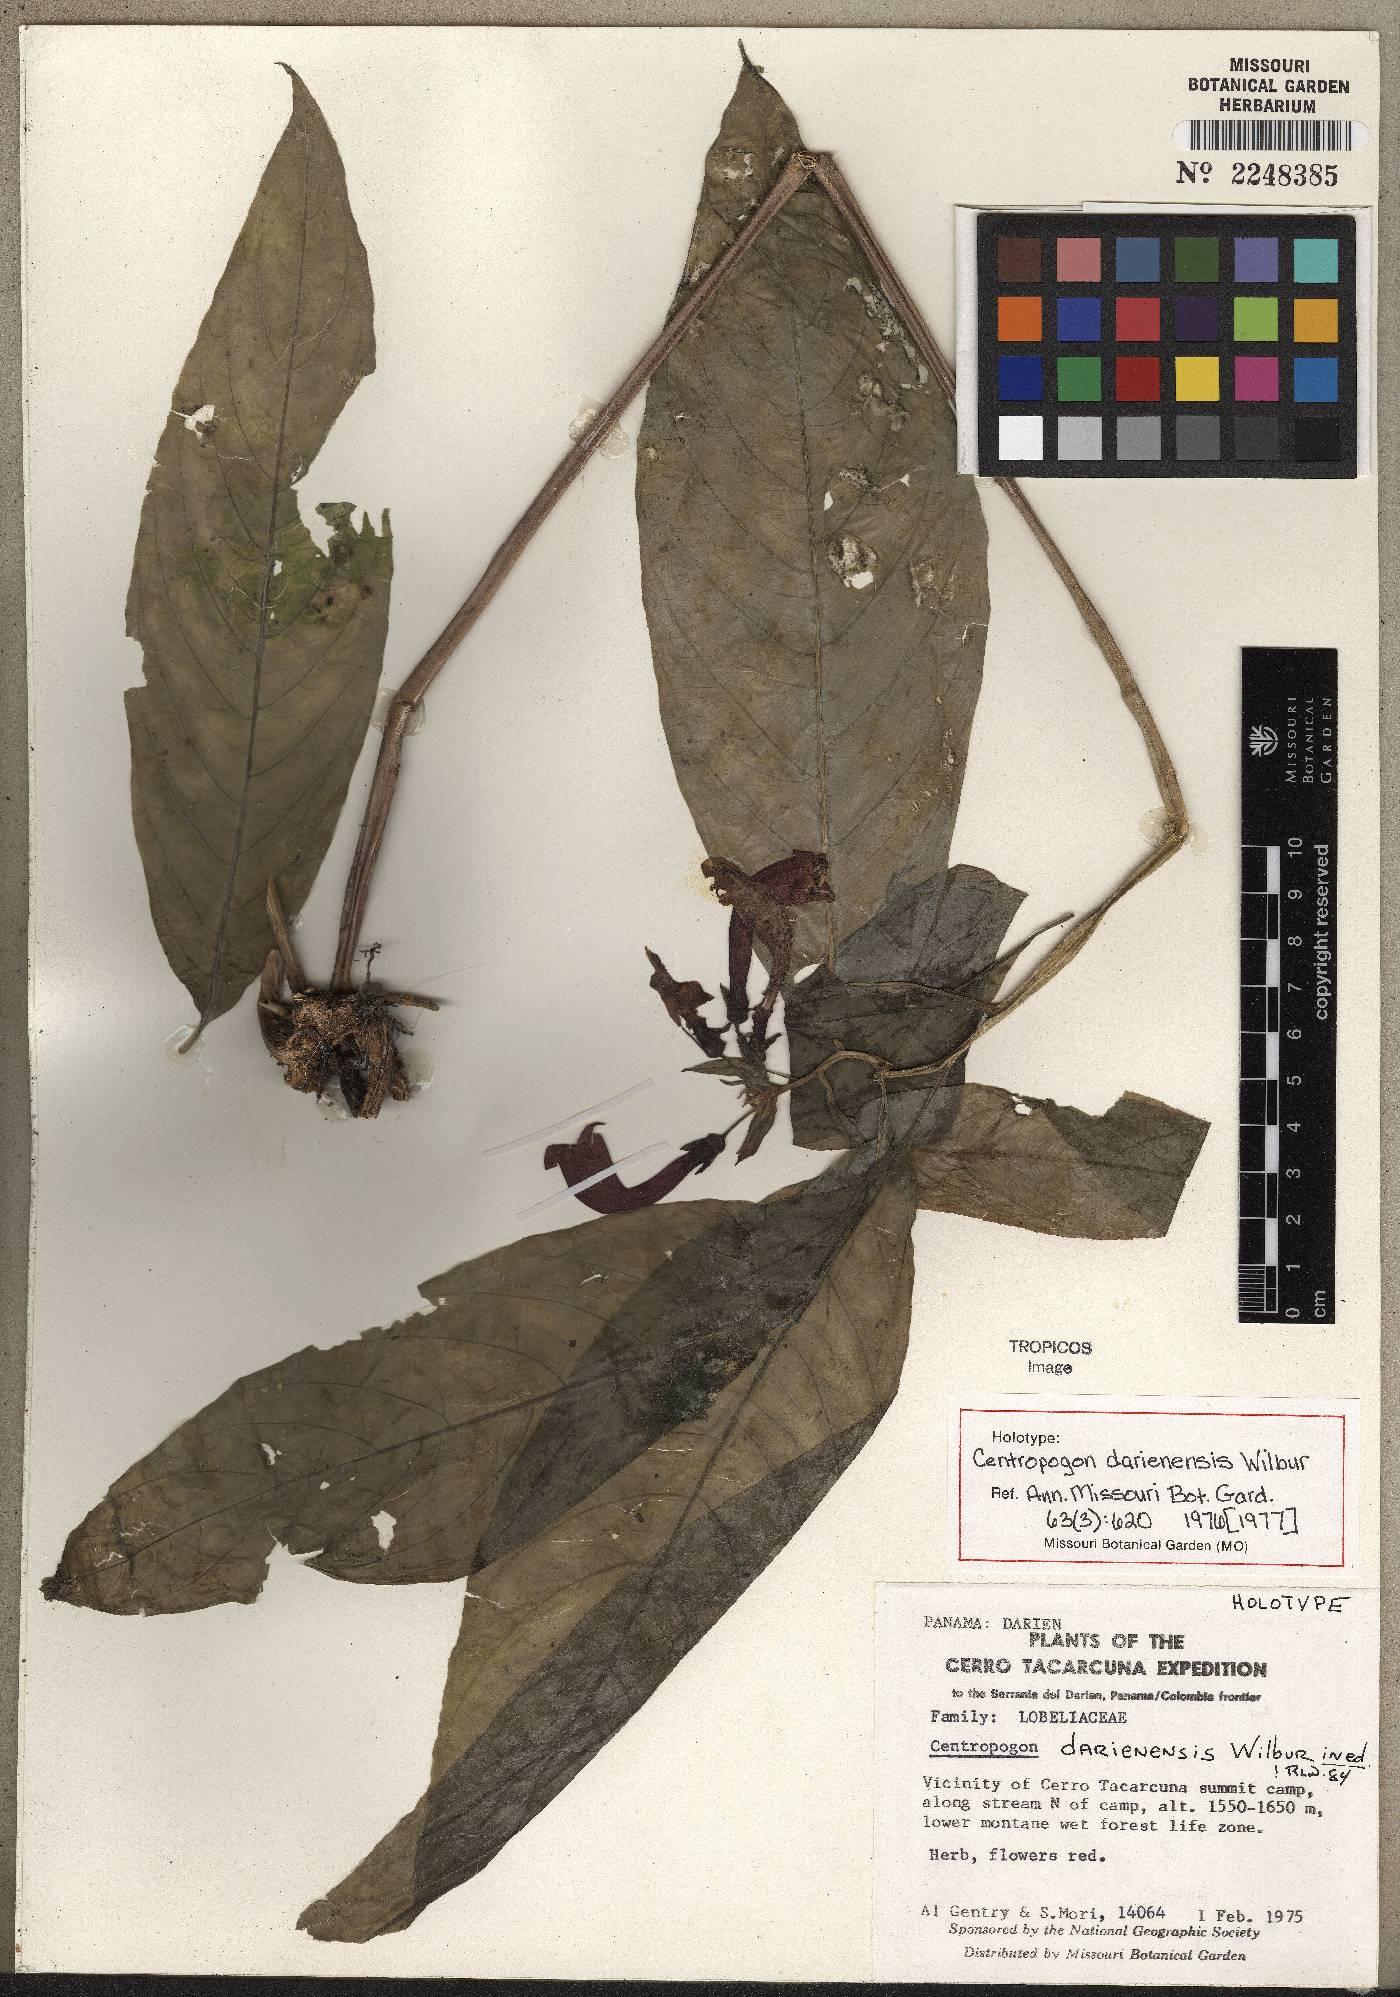 Centropogon darienensis image